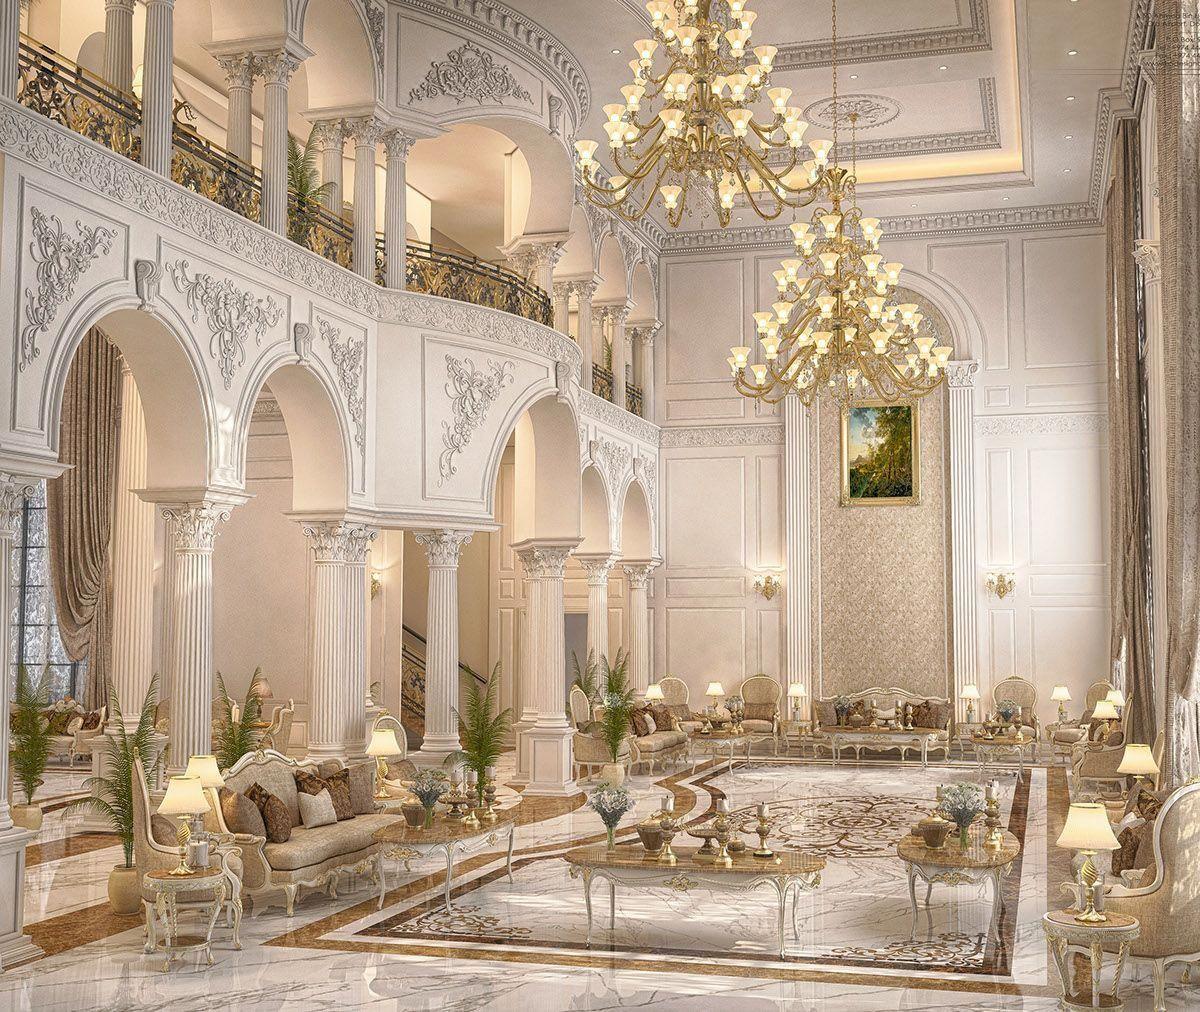 Luxury Mansion Interior Qatar On Behance: Enhance Your Senses With Luxury Home Decor